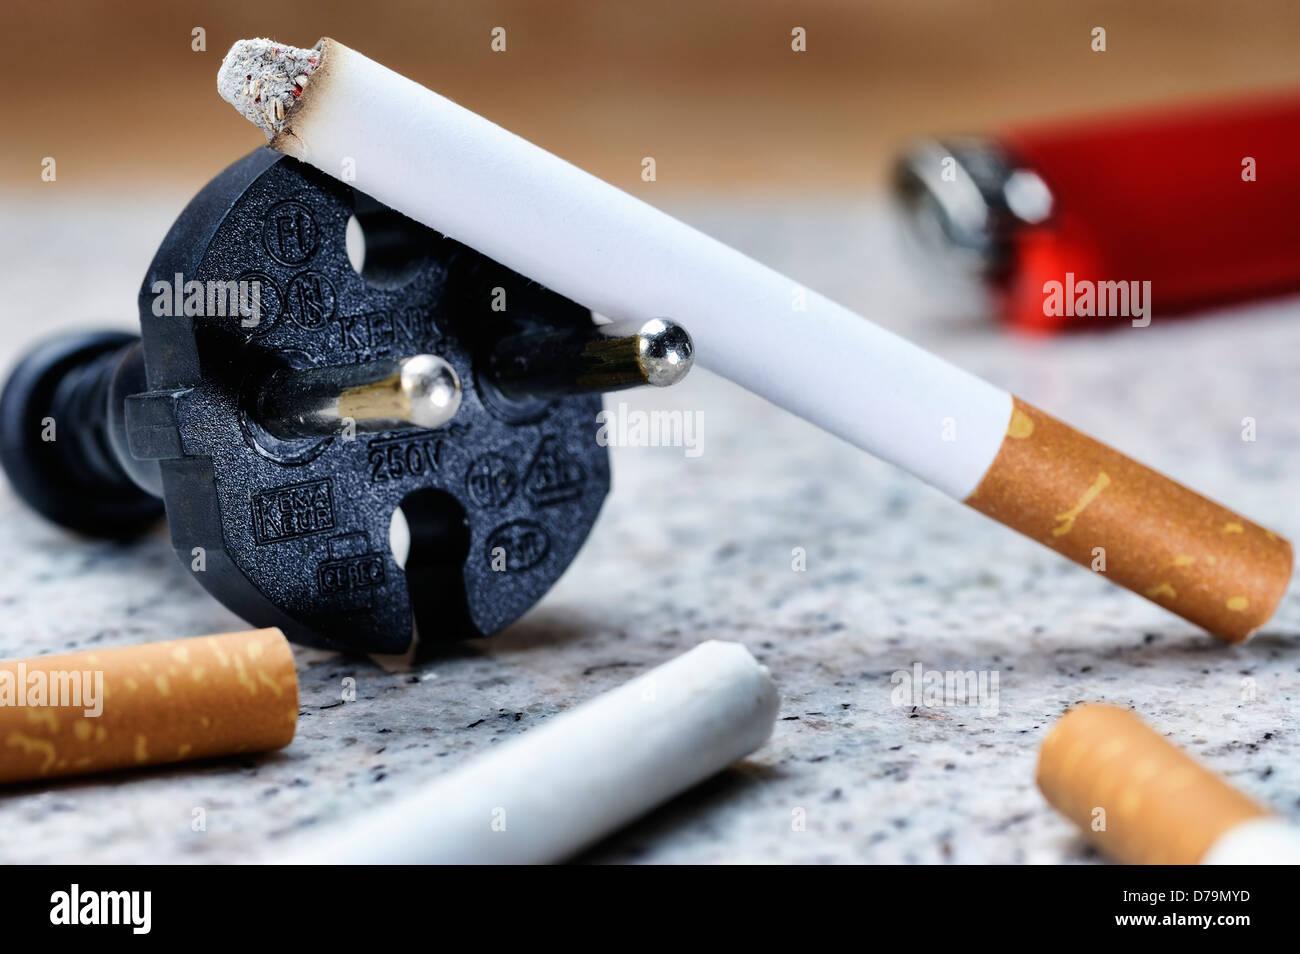 zigarette rauchen stock photos zigarette rauchen stock images alamy. Black Bedroom Furniture Sets. Home Design Ideas